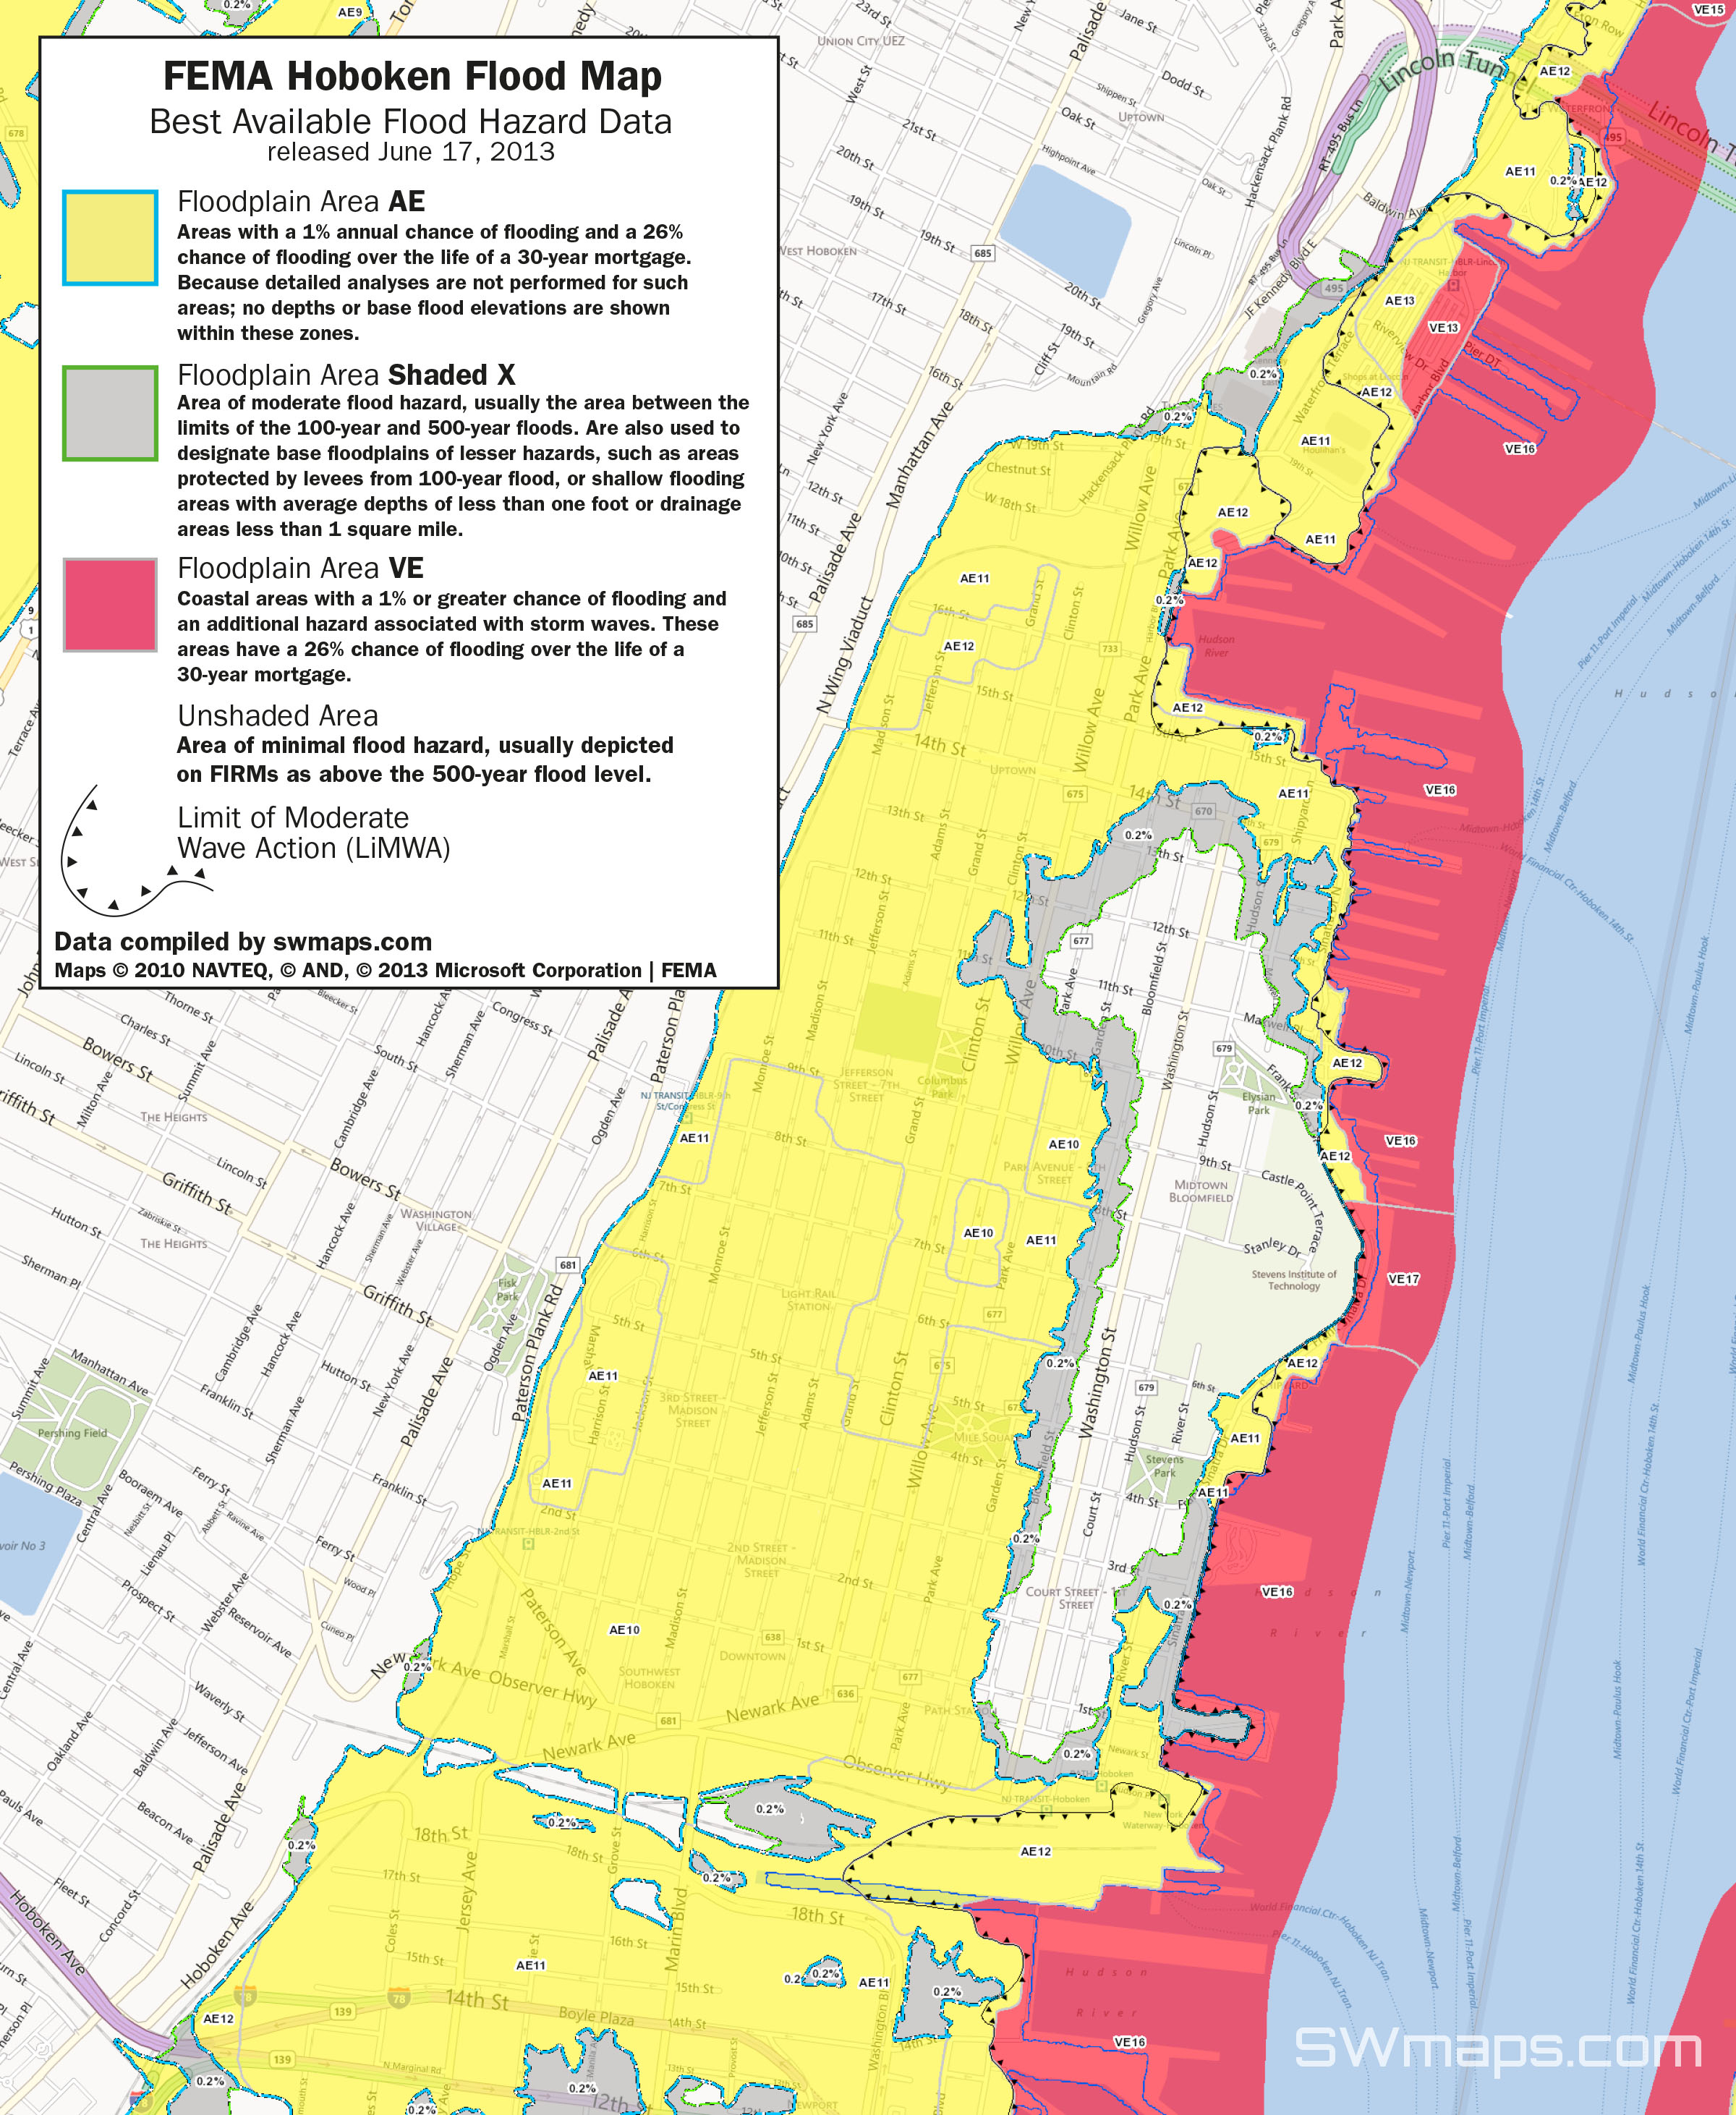 New Hoboken Flood Map: Fema Best Available Flood Hazard Data - Fema Flood Zone Map Florida